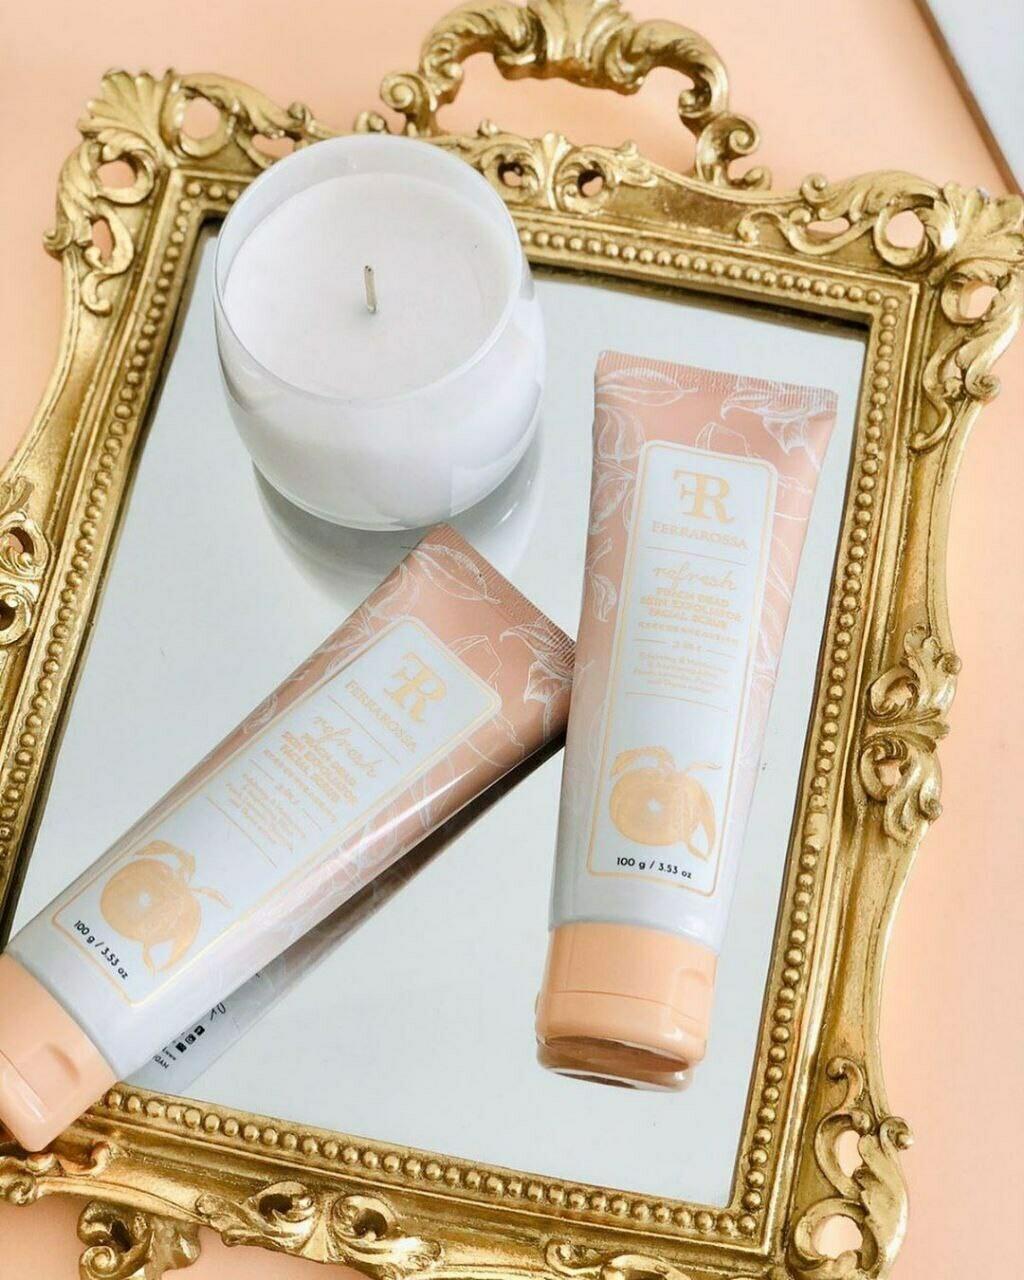 Ferrarossa Peach Dead Skin Exfoliator Facial Scrub